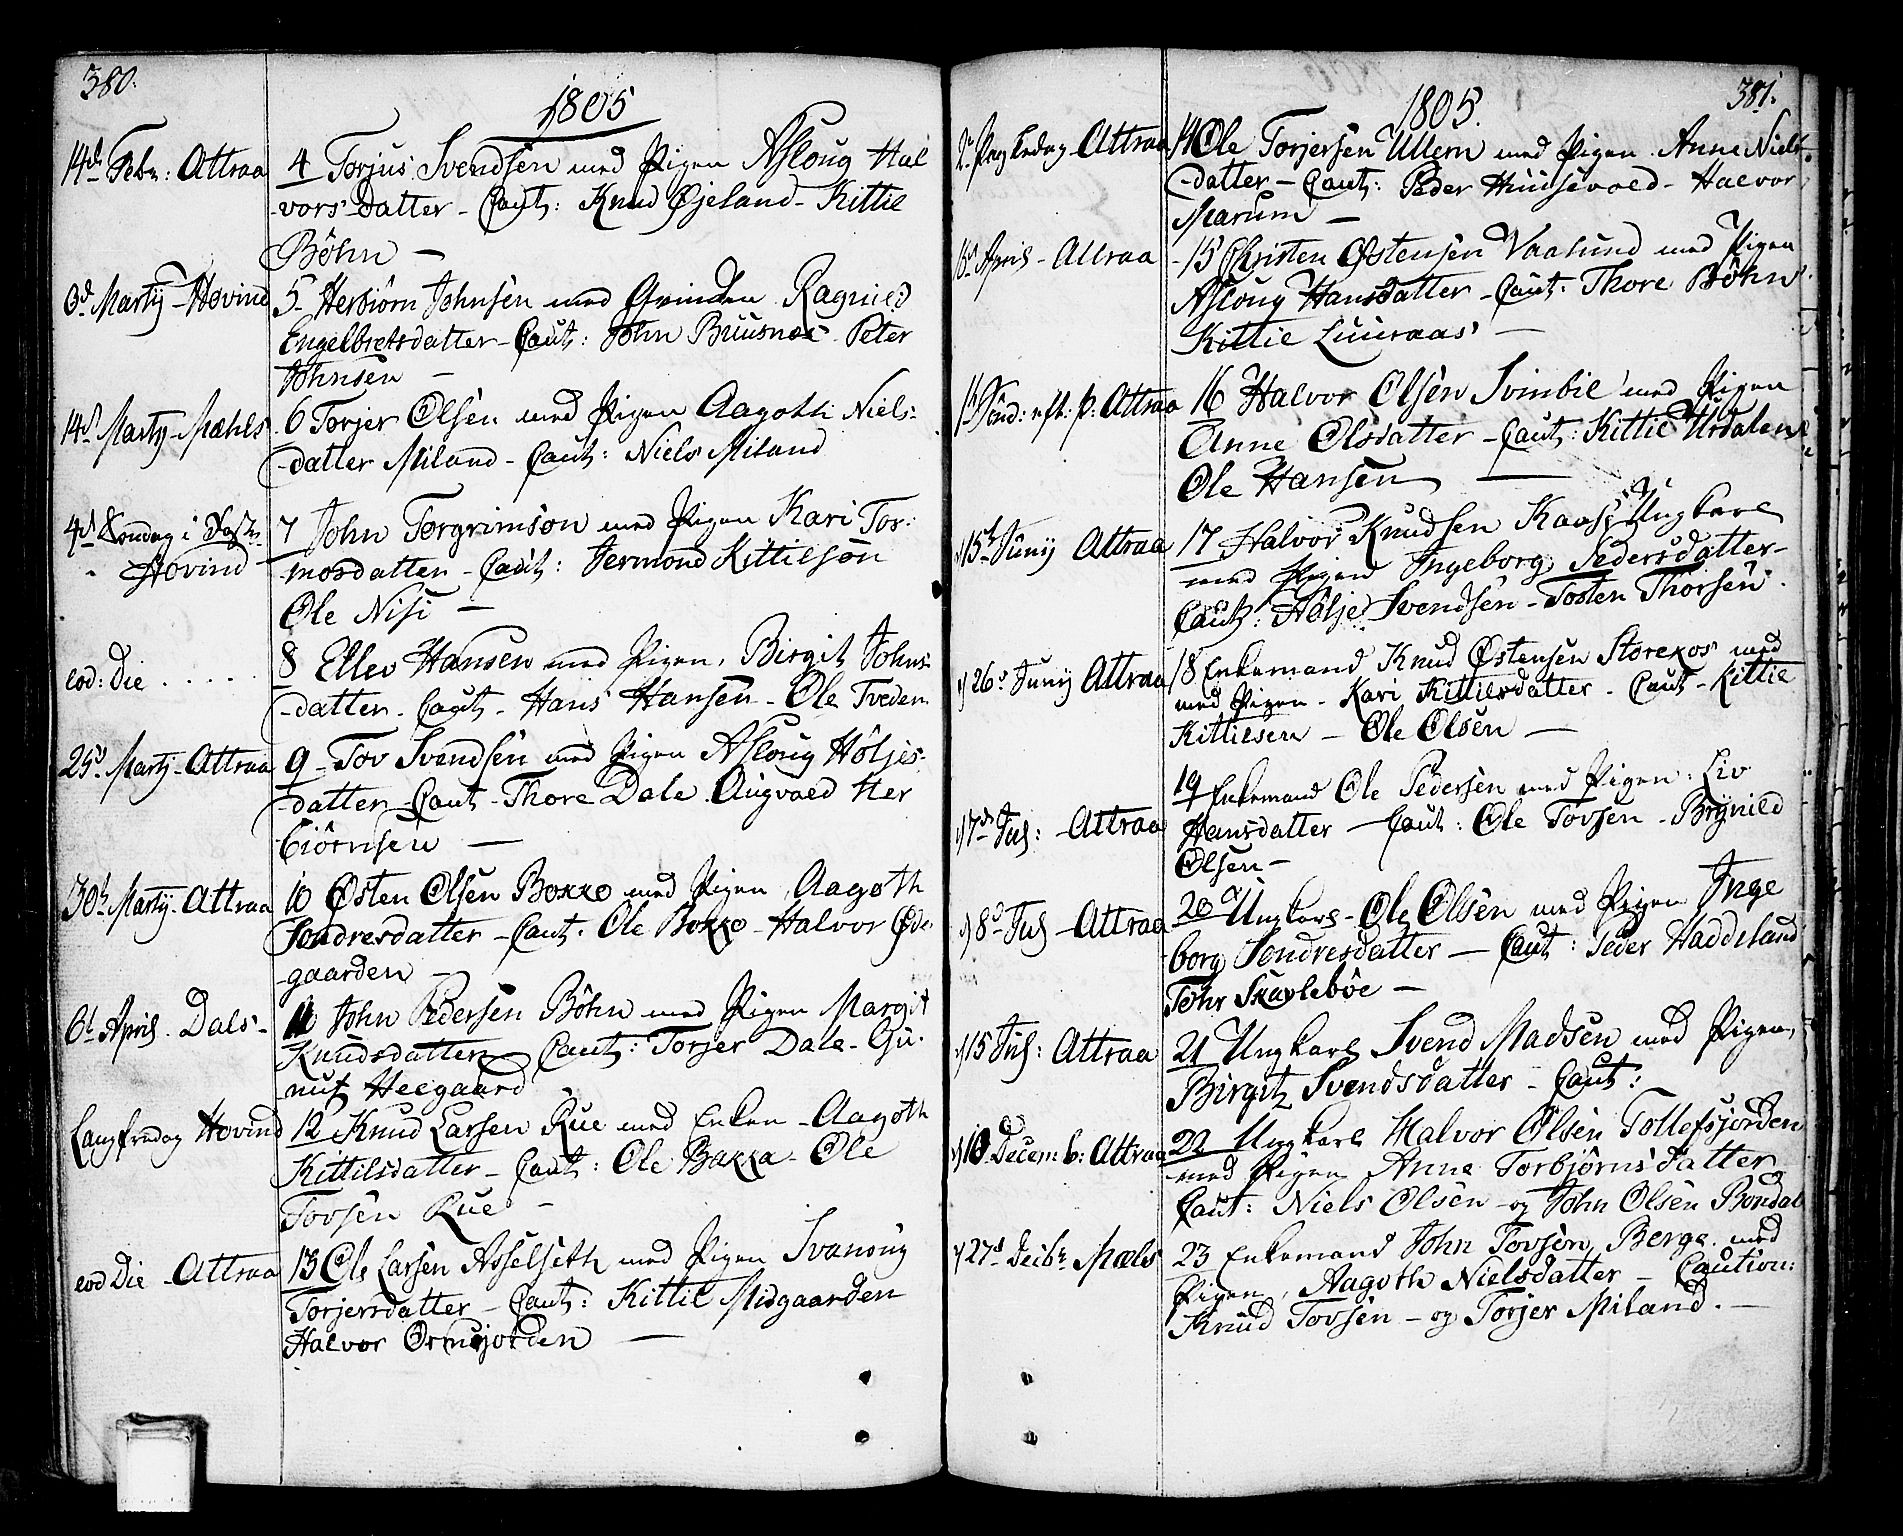 SAKO, Tinn kirkebøker, F/Fa/L0002: Ministerialbok nr. I 2, 1757-1810, s. 380-381